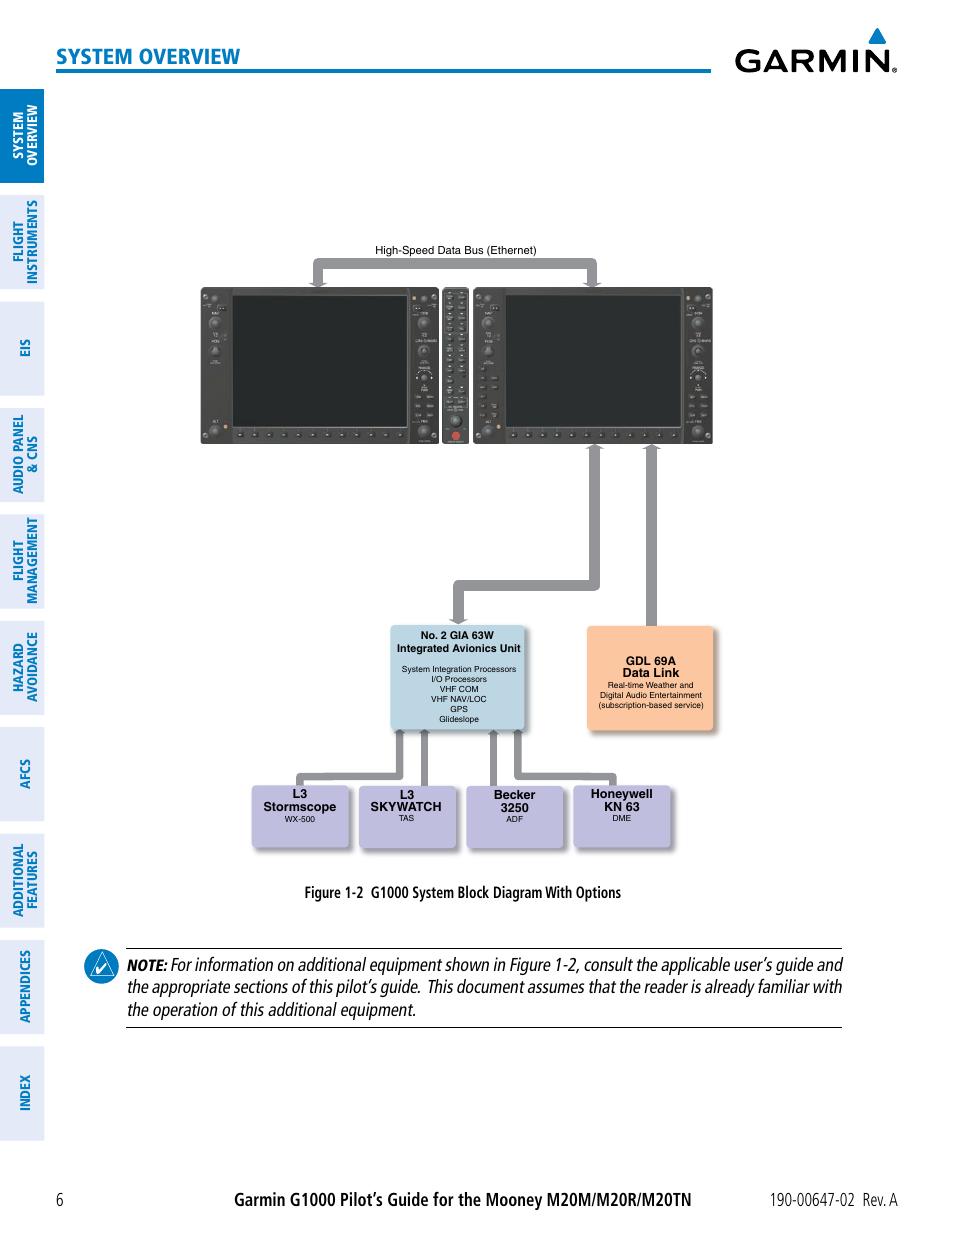 system overview garmin g1000 mooney m20tn user manual page 20 rh manualsdir com garmin g1000 user manual download garmin edge 1000 user manual pdf